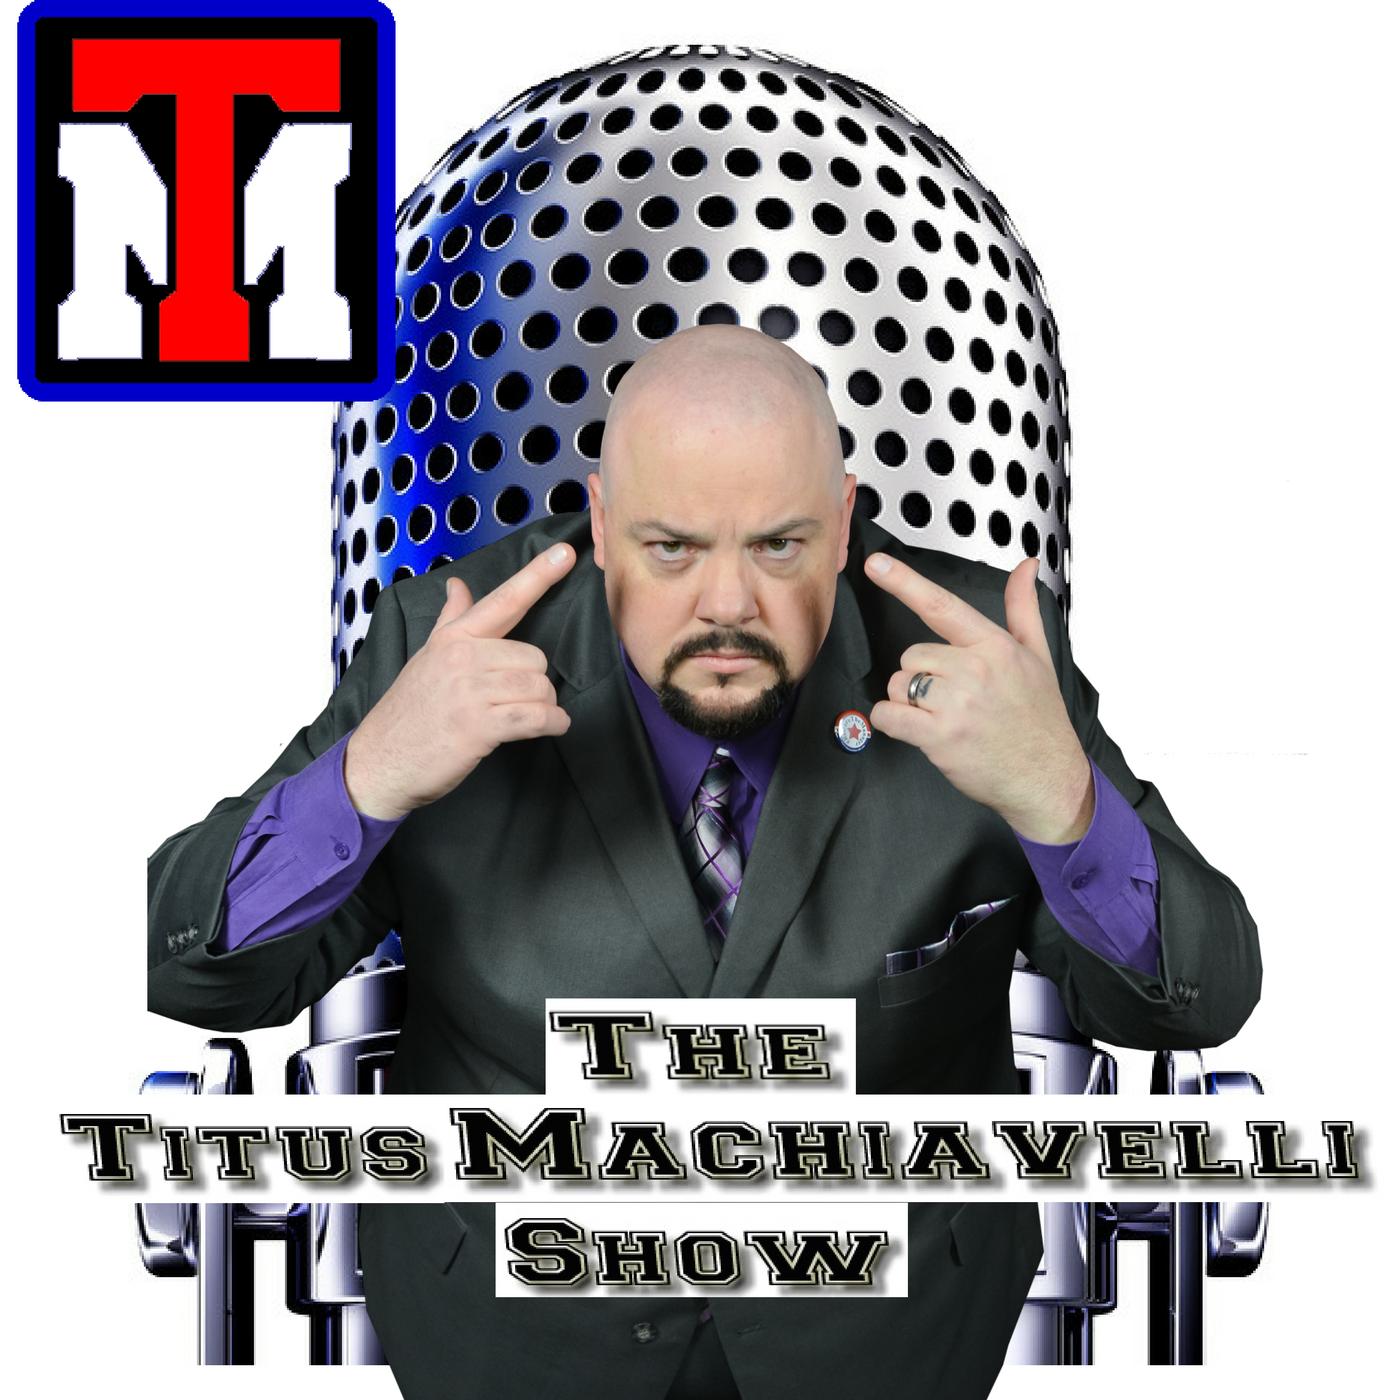 The Titus Machiavelli Show